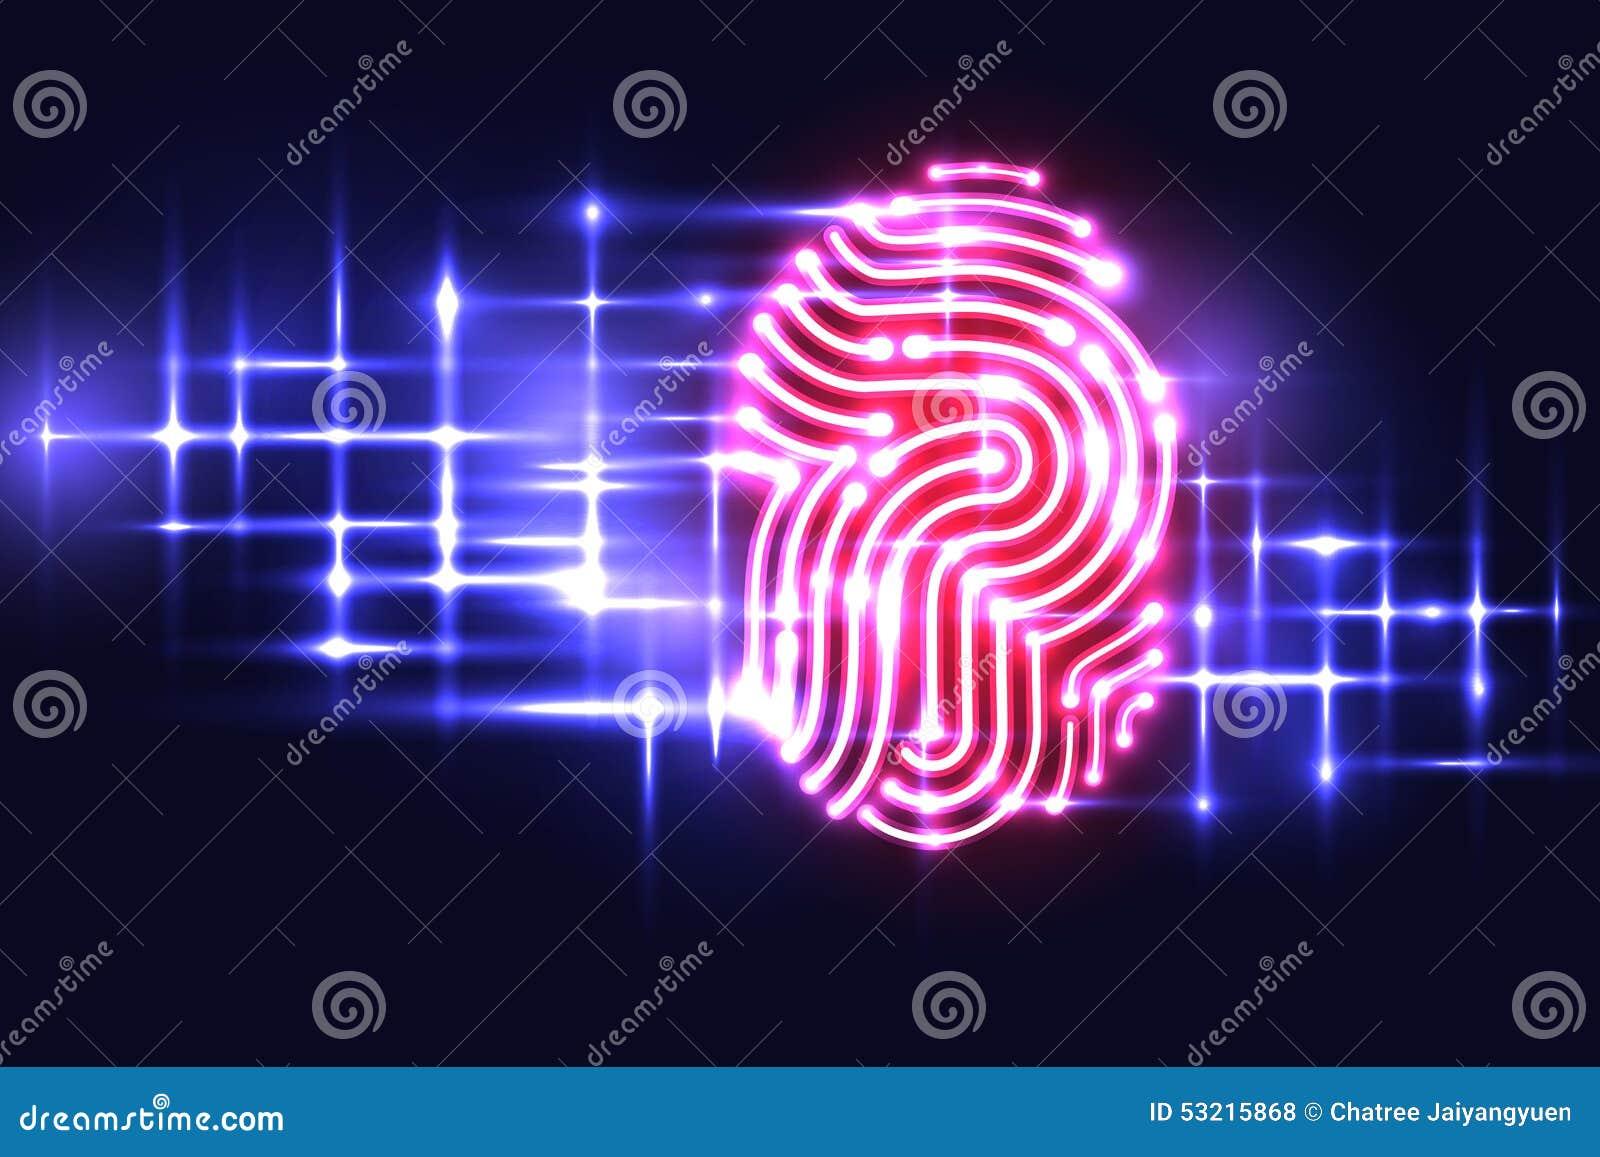 Abstract Fingerprint technology background.Letter P.